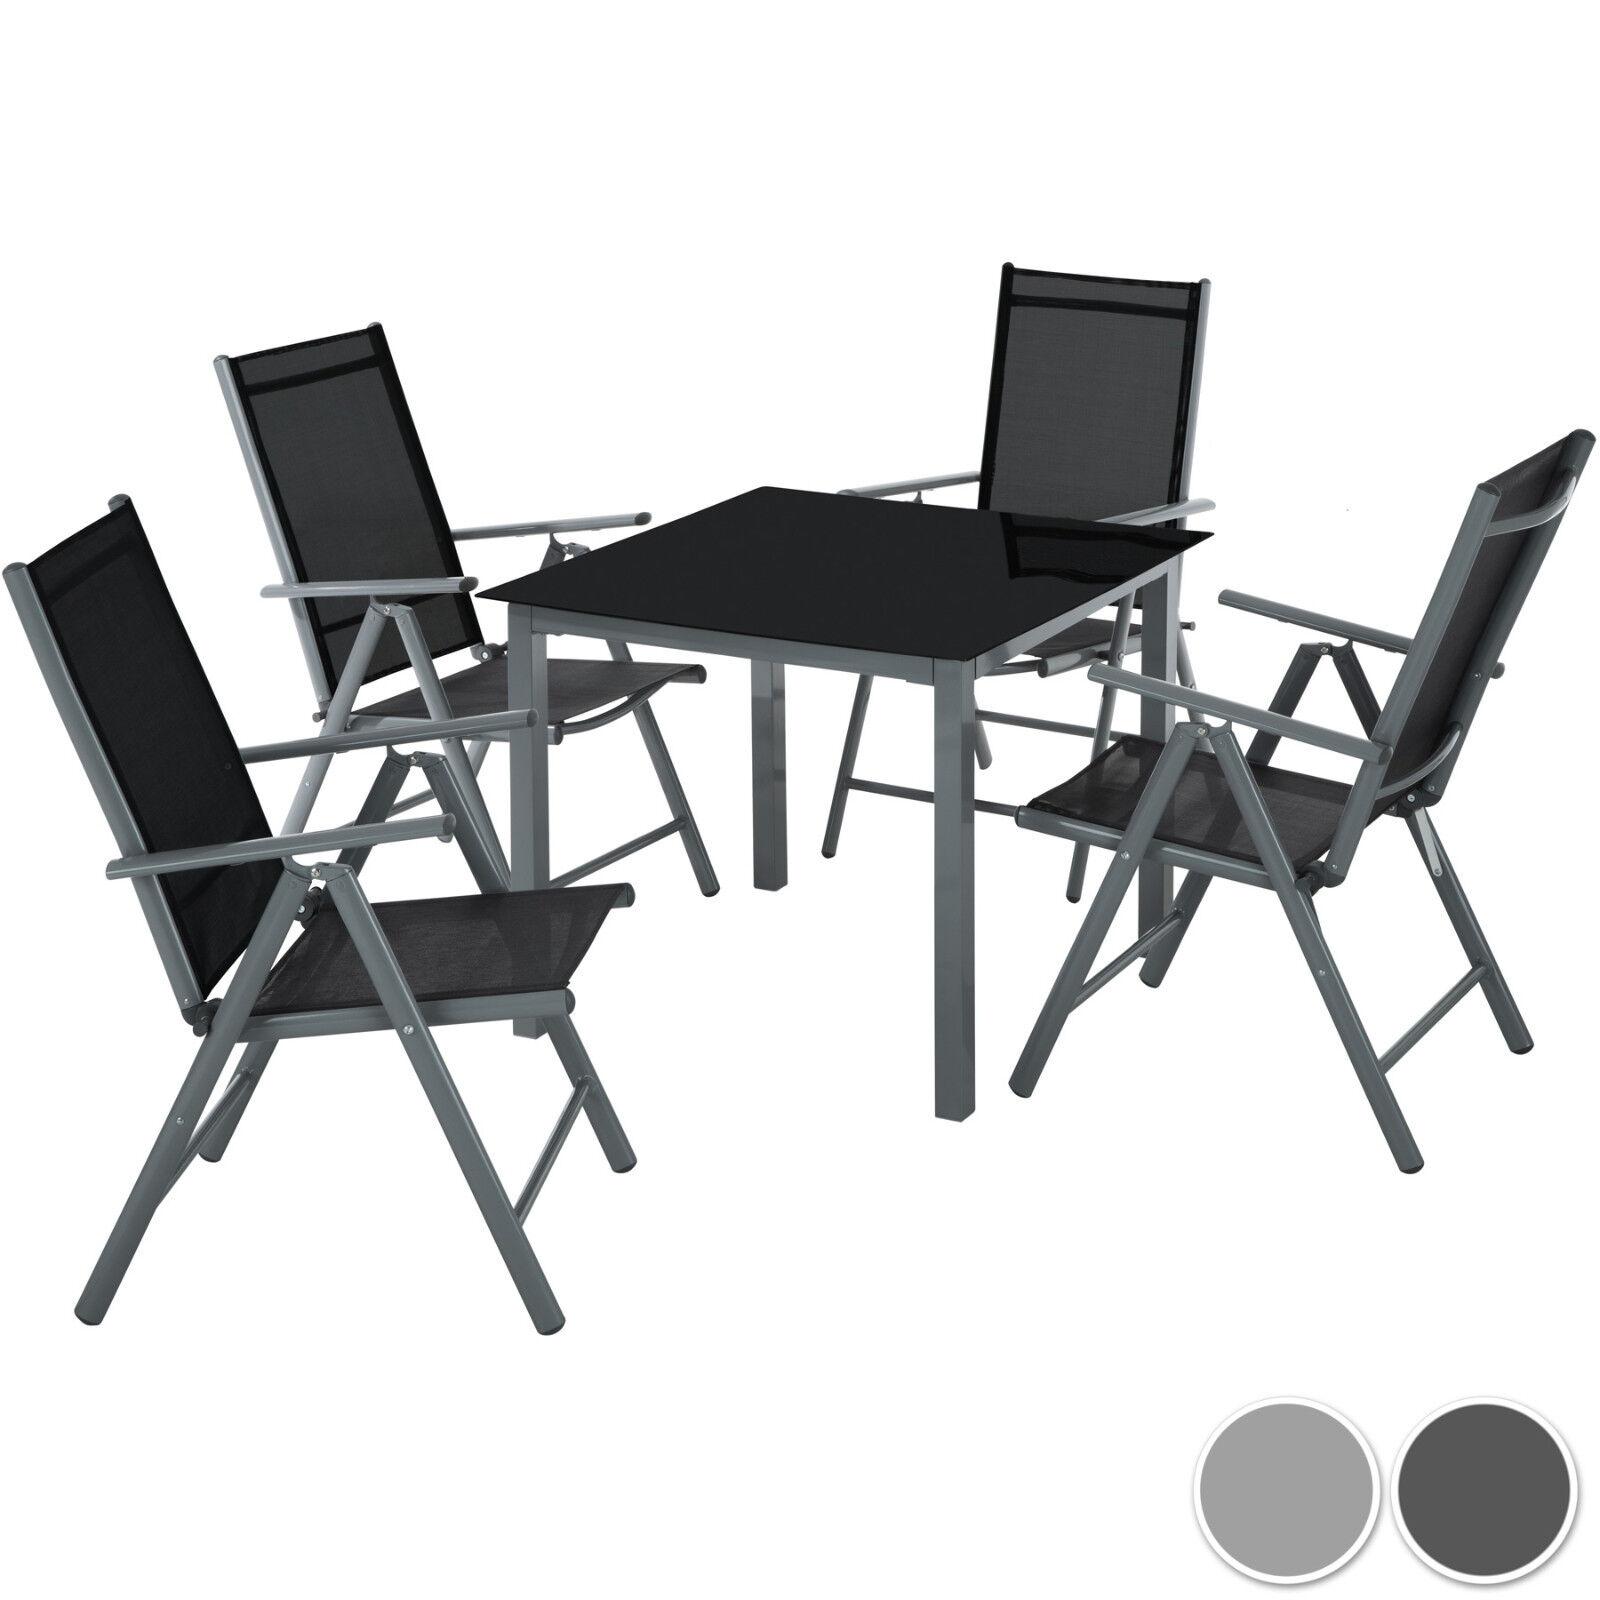 4+1 Alu Sitzgruppe Gartenmöbel Gartengarnitur Tisch Stuhl Essgruppe Gartenset